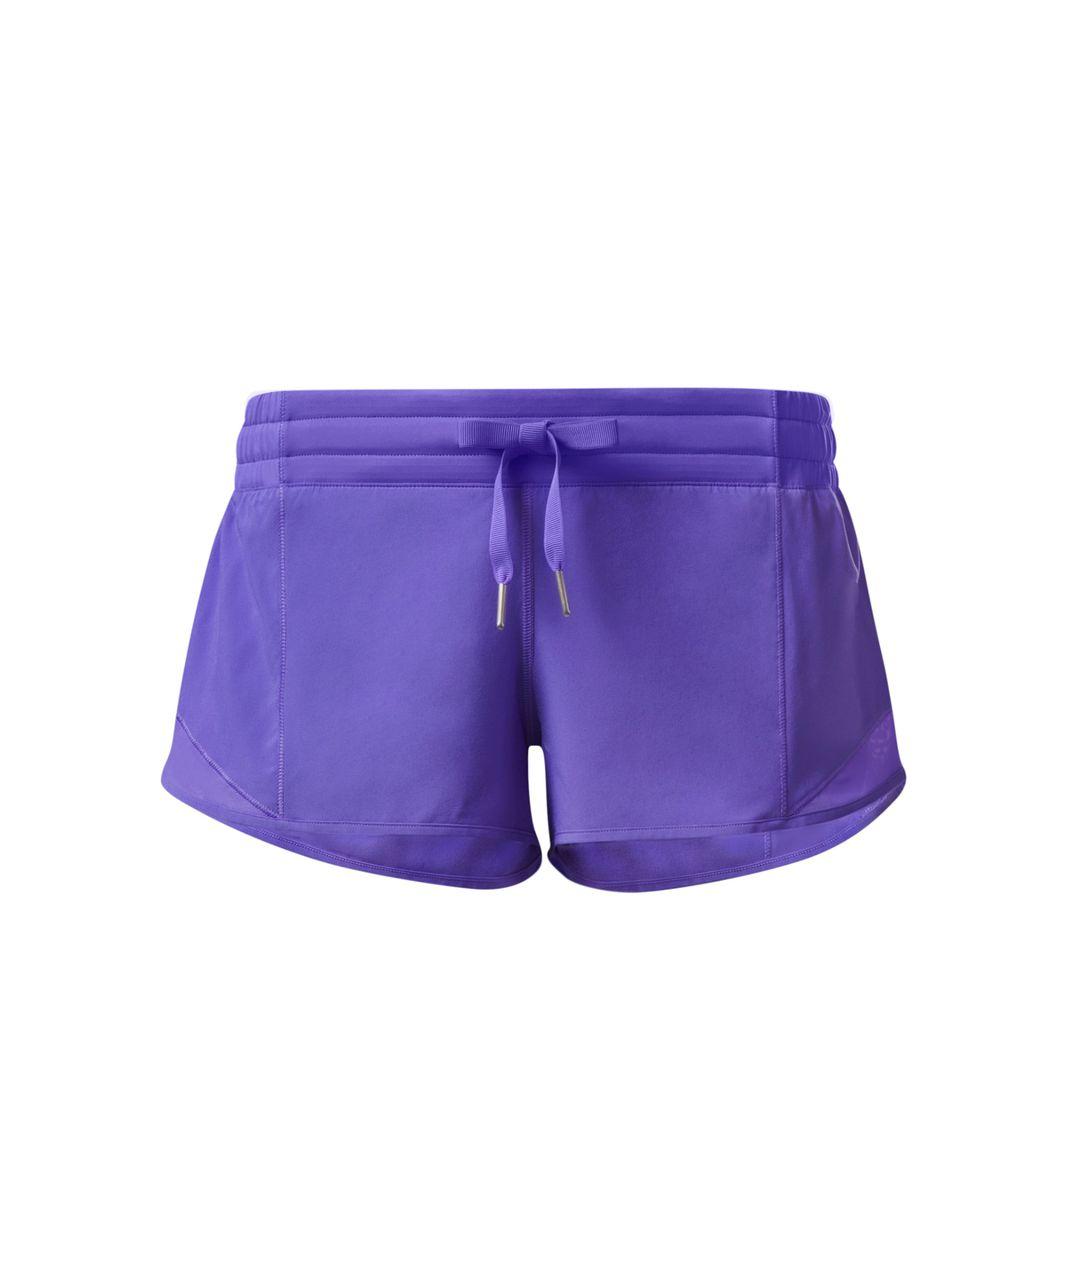 Lululemon Hotty Hot Short - Power Purple